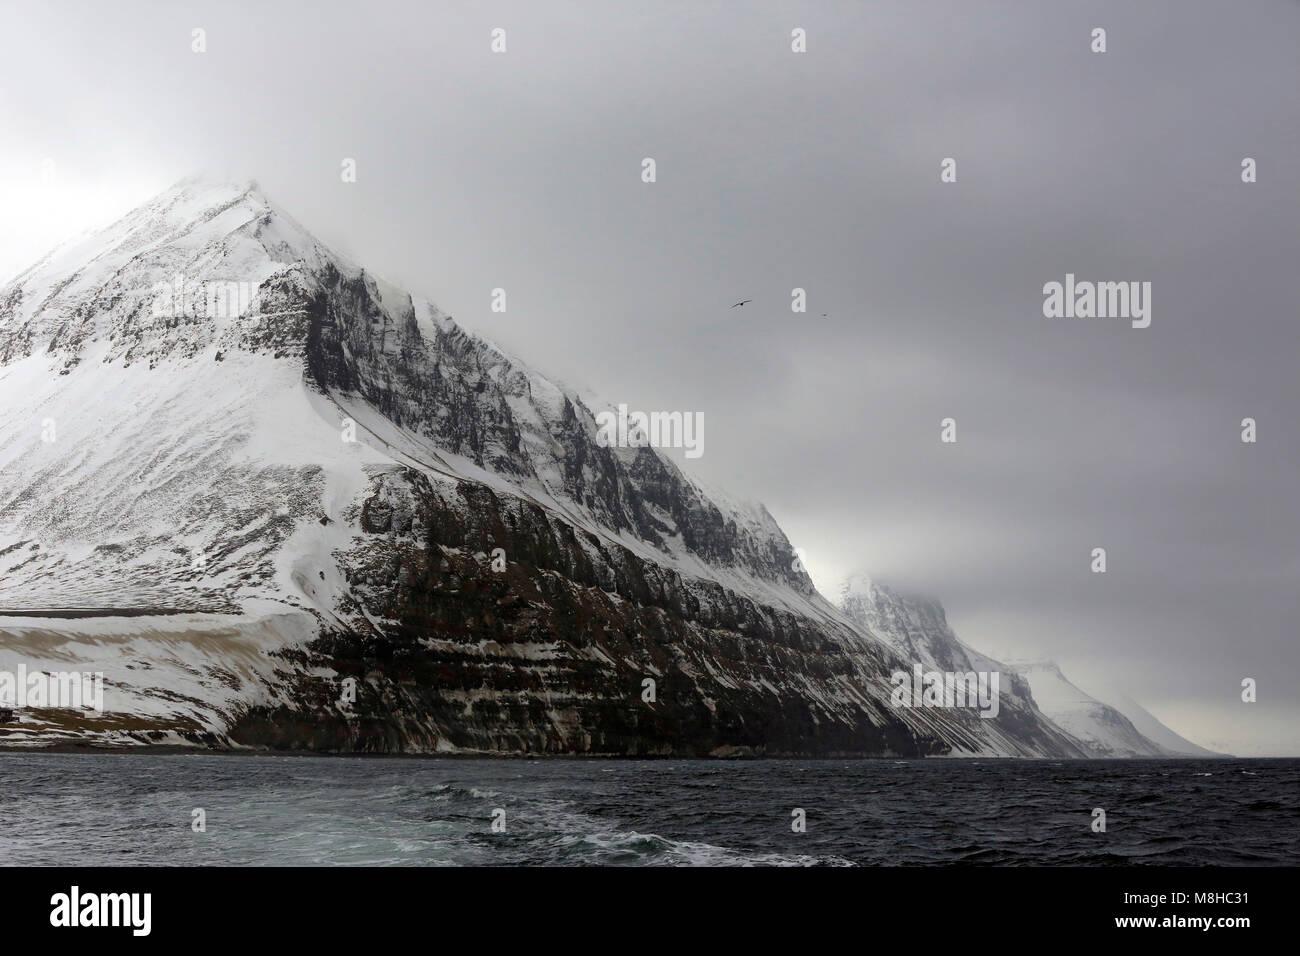 Snowy Mountains outside Longearbyen, Viewed from Water. Svalbard, Norway - Stock Image